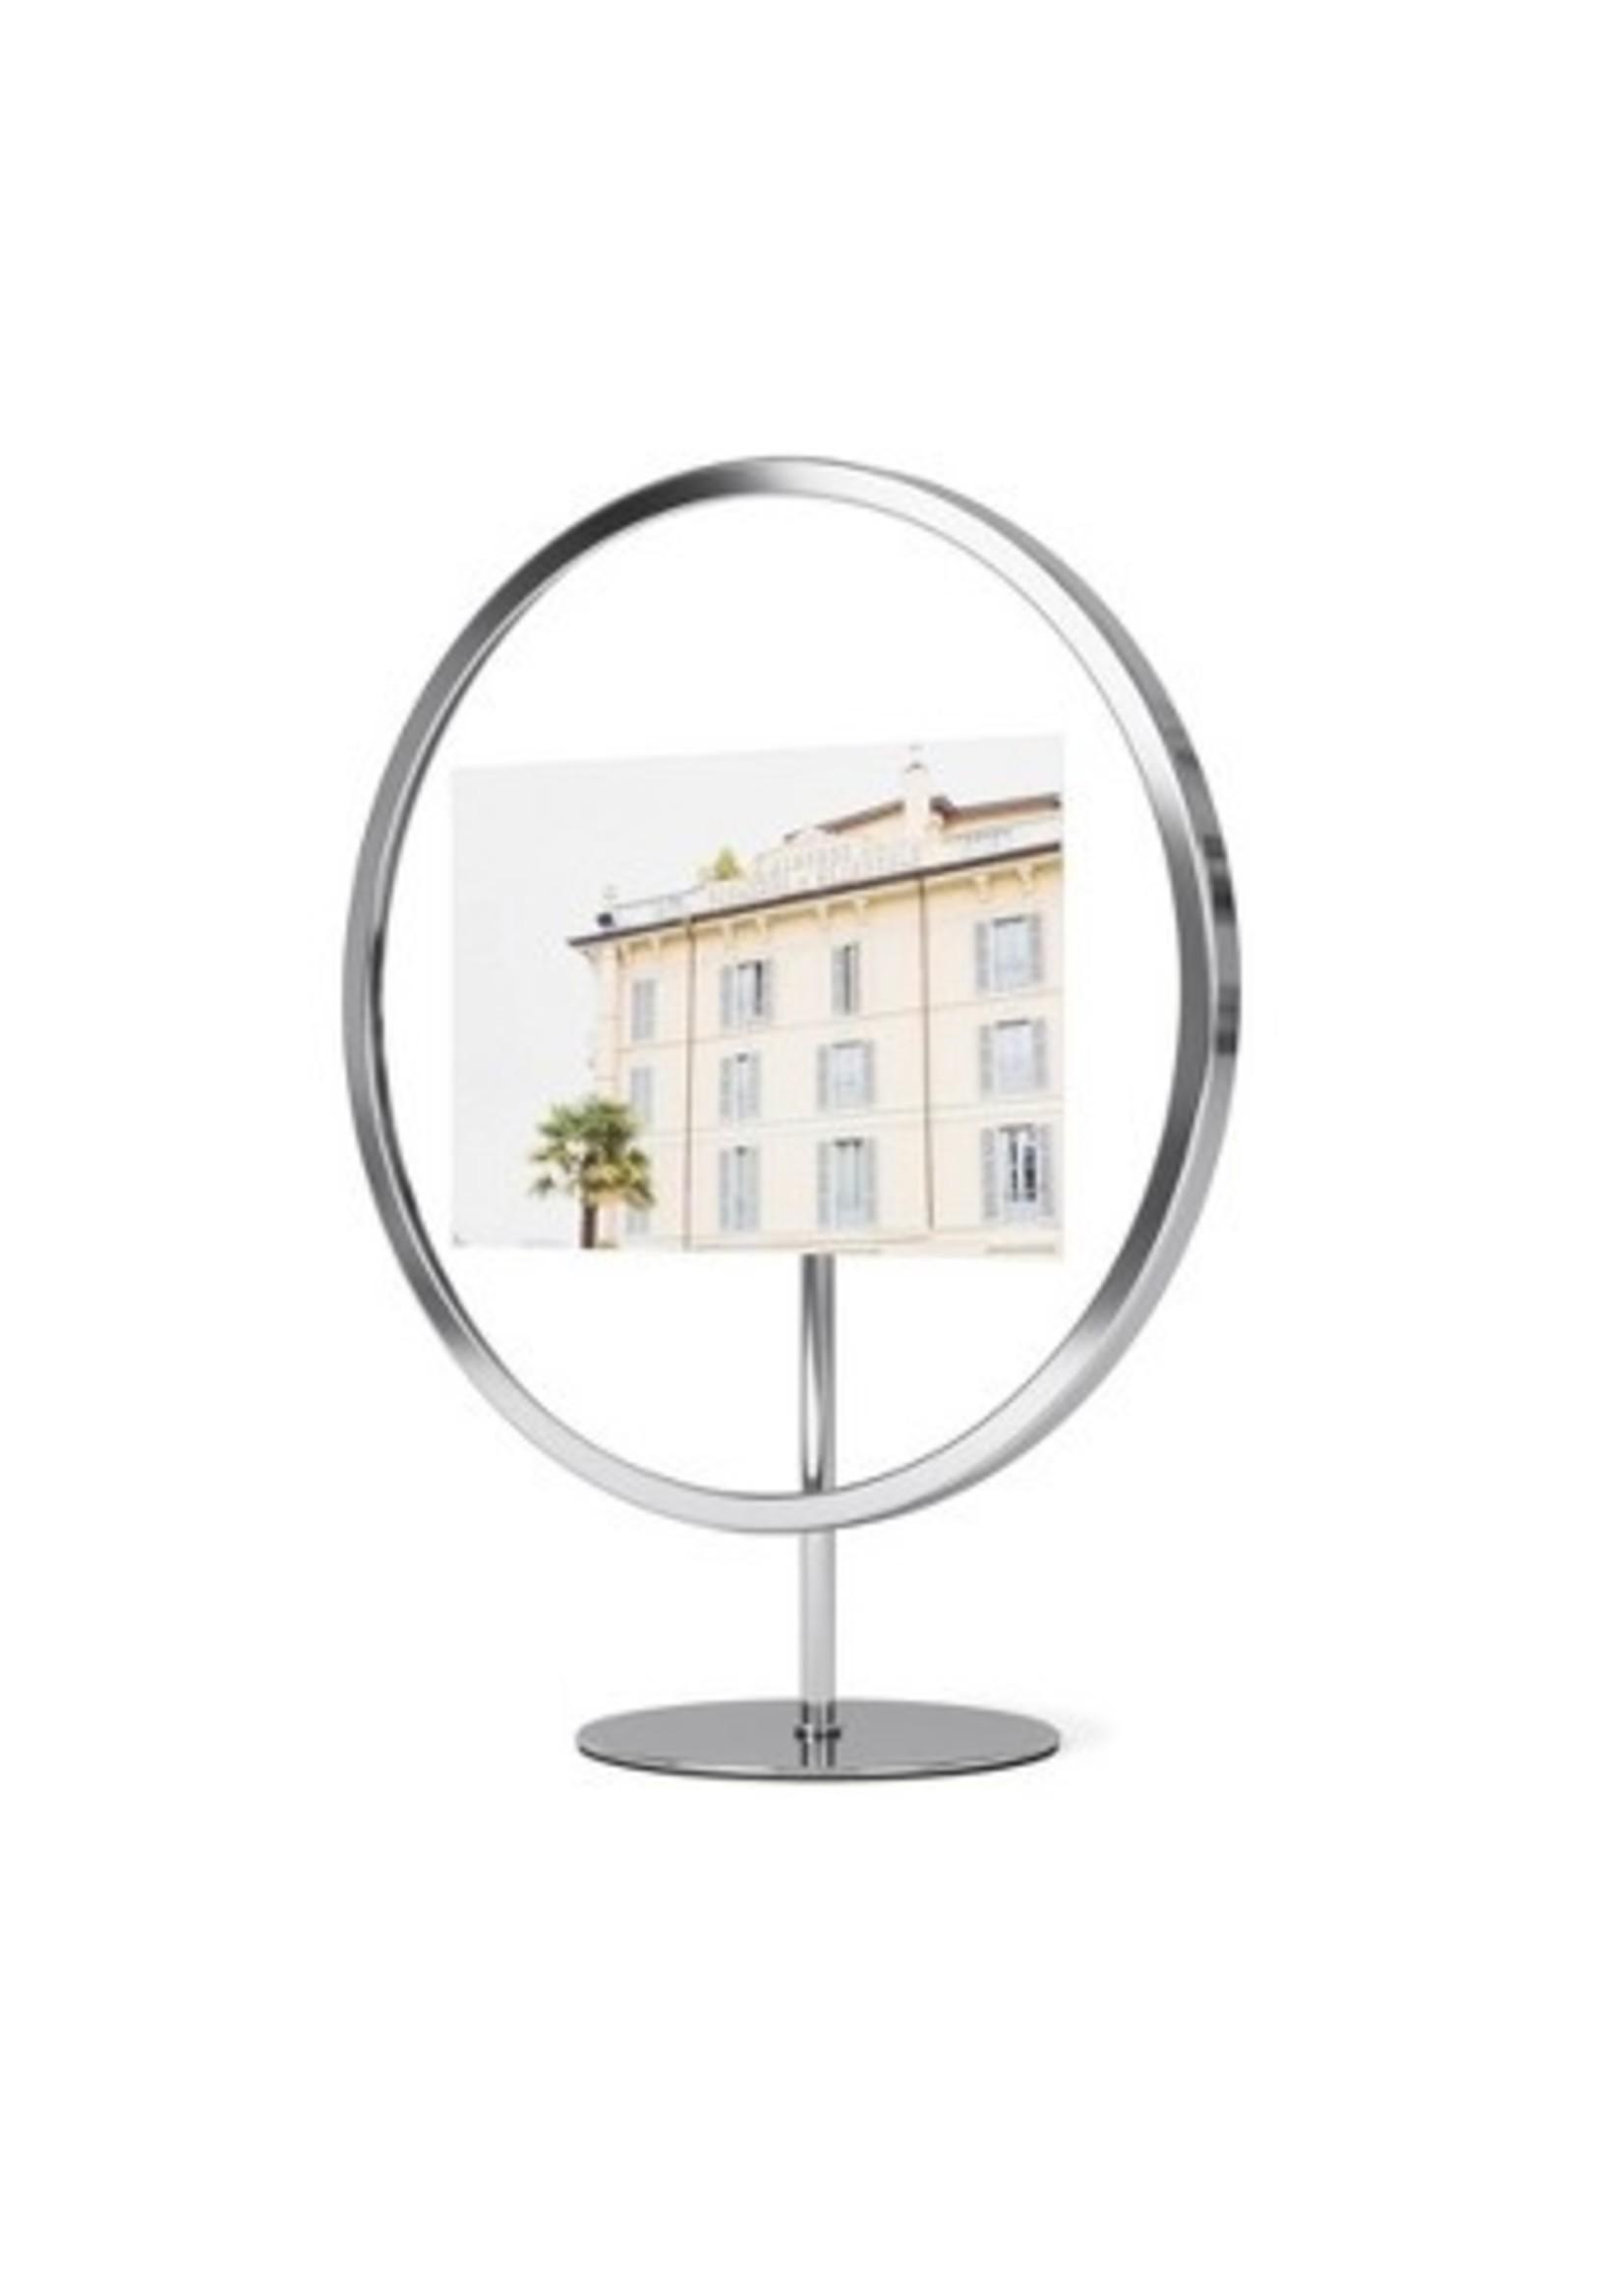 "Umbra Infinity Round Frame - Chrome - 4""x6"""